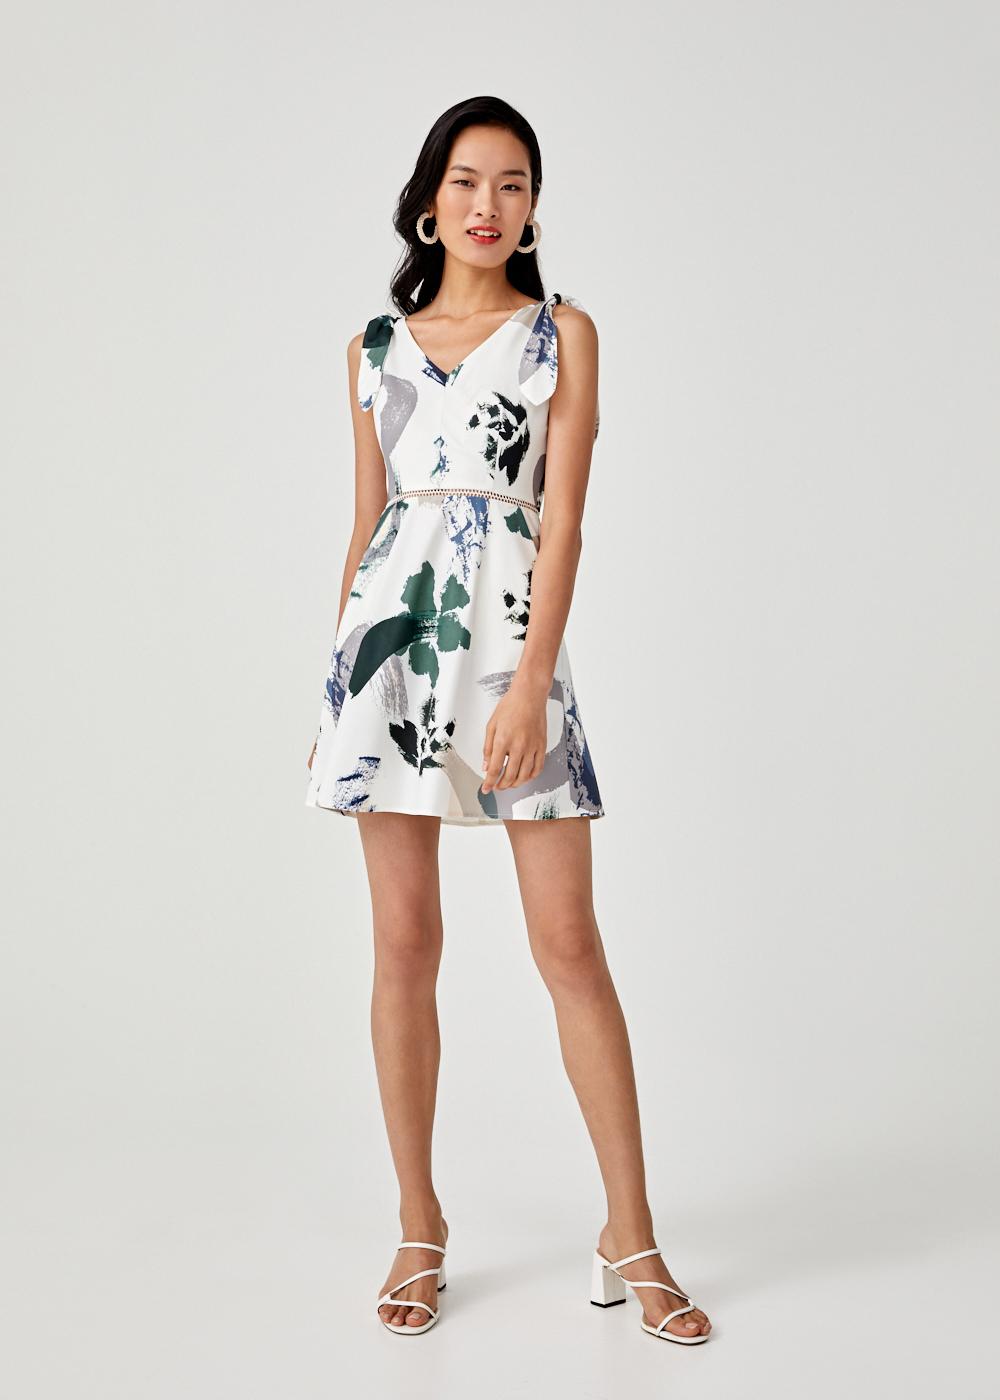 Buy Anne Printed A-line Dress in Artful